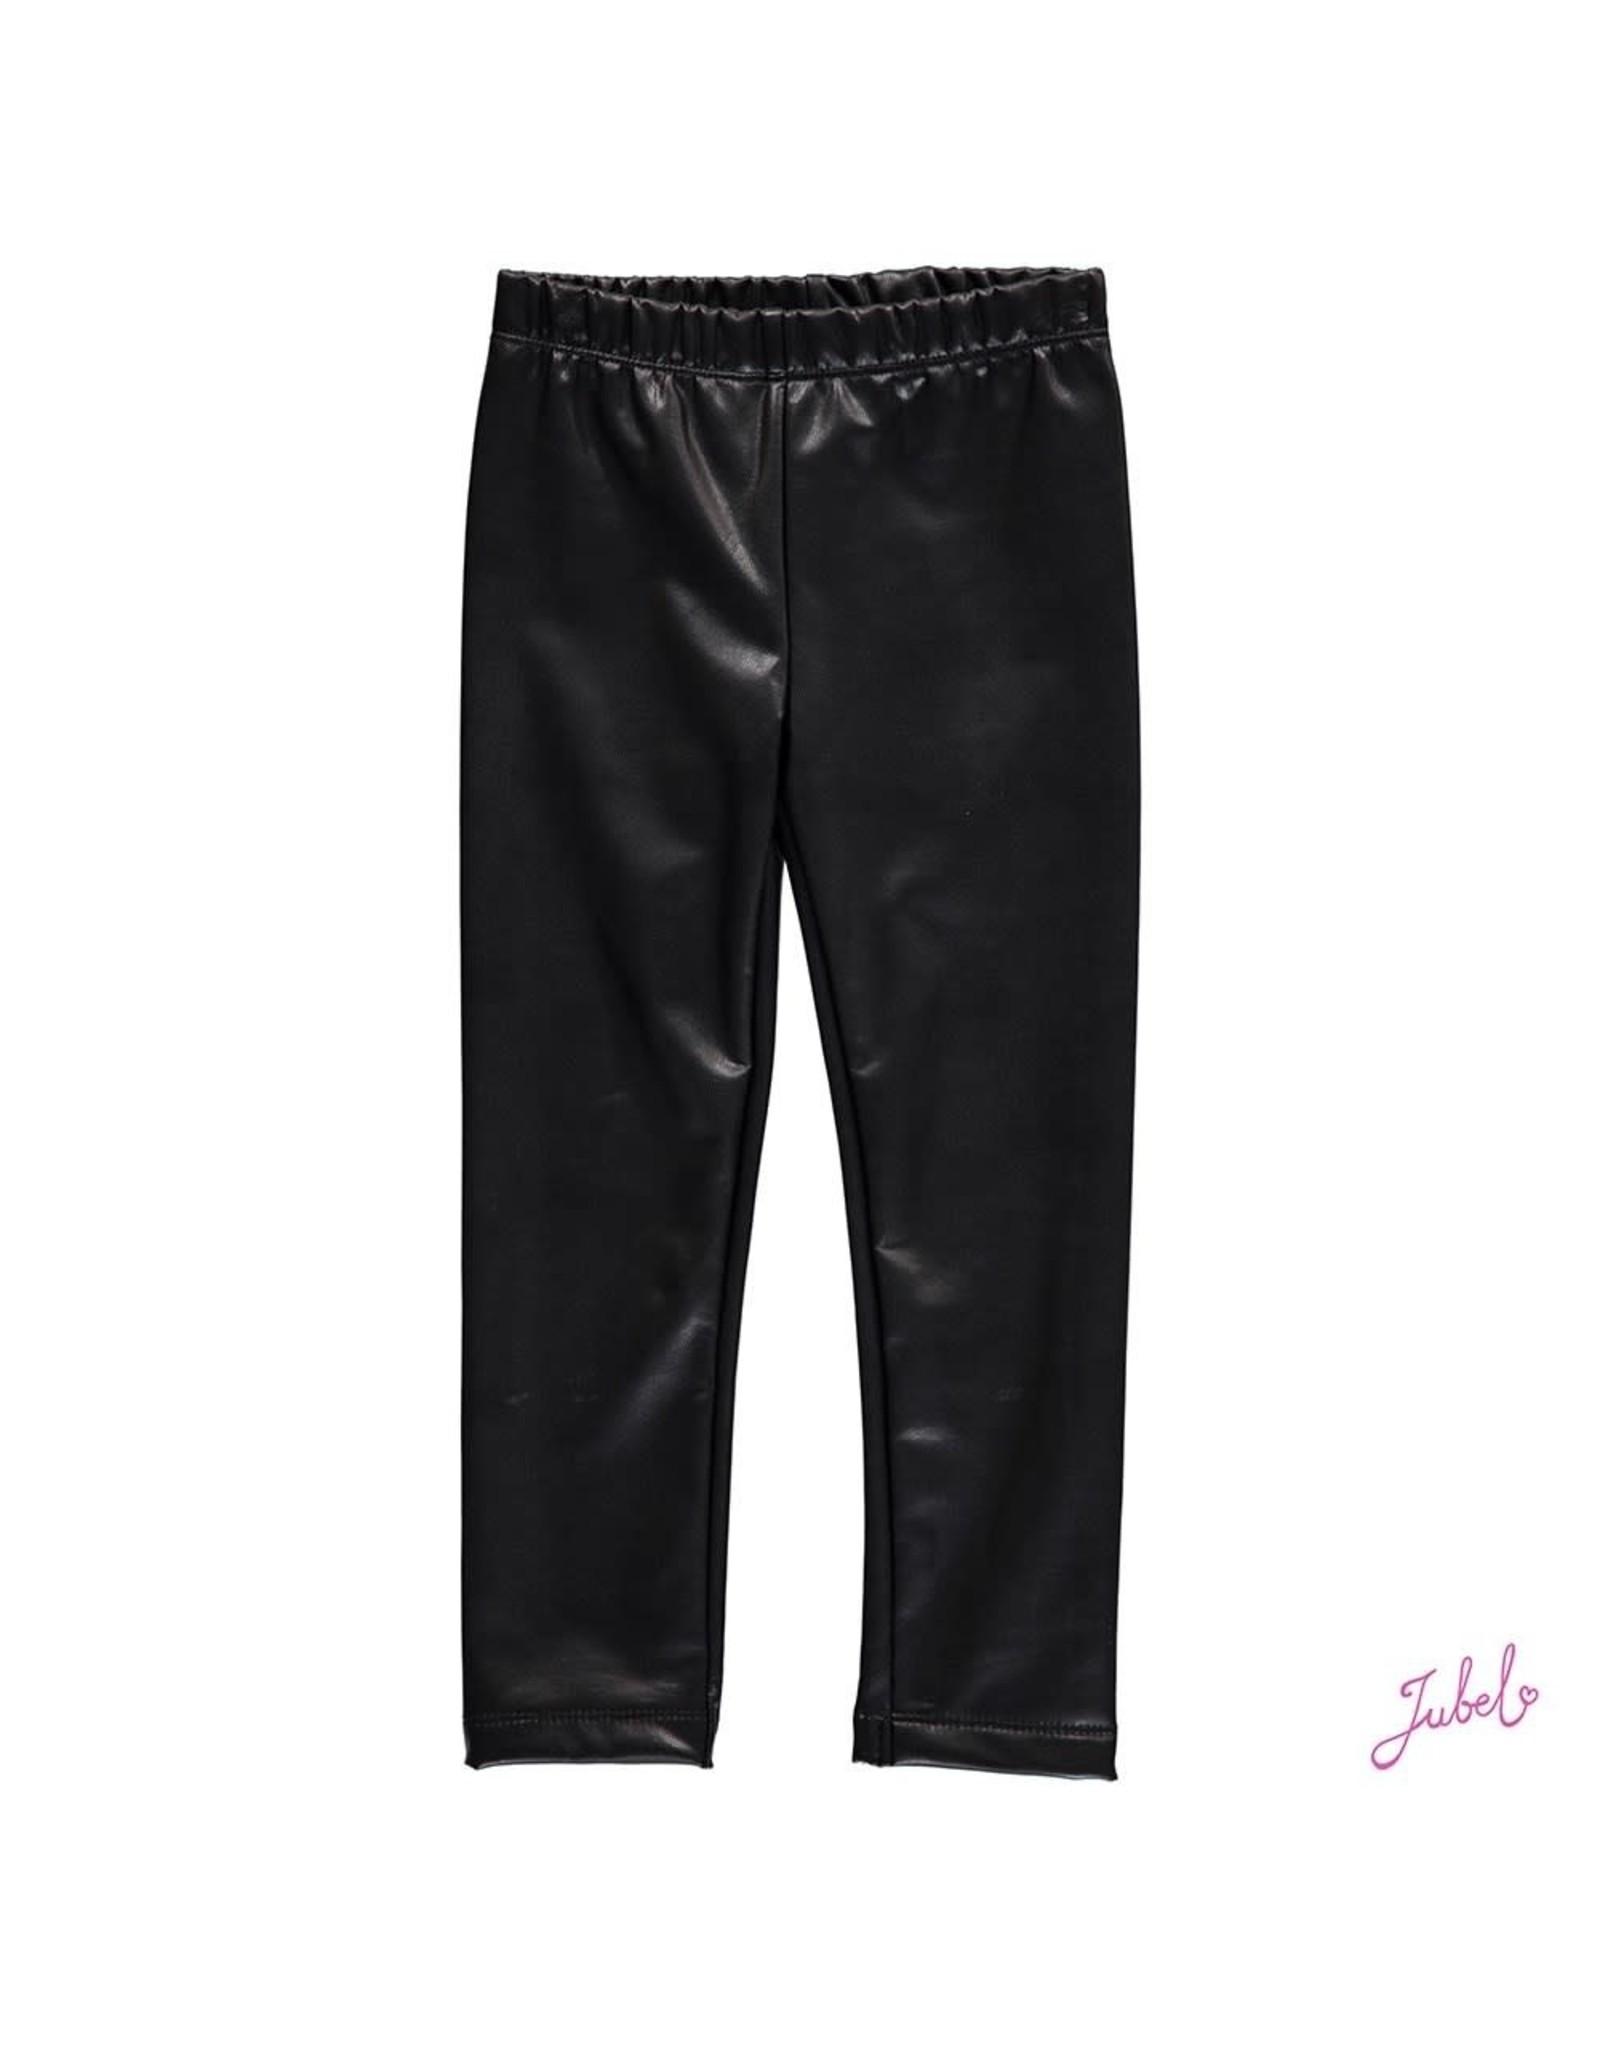 Jubel Legging lederlook 700 zwart